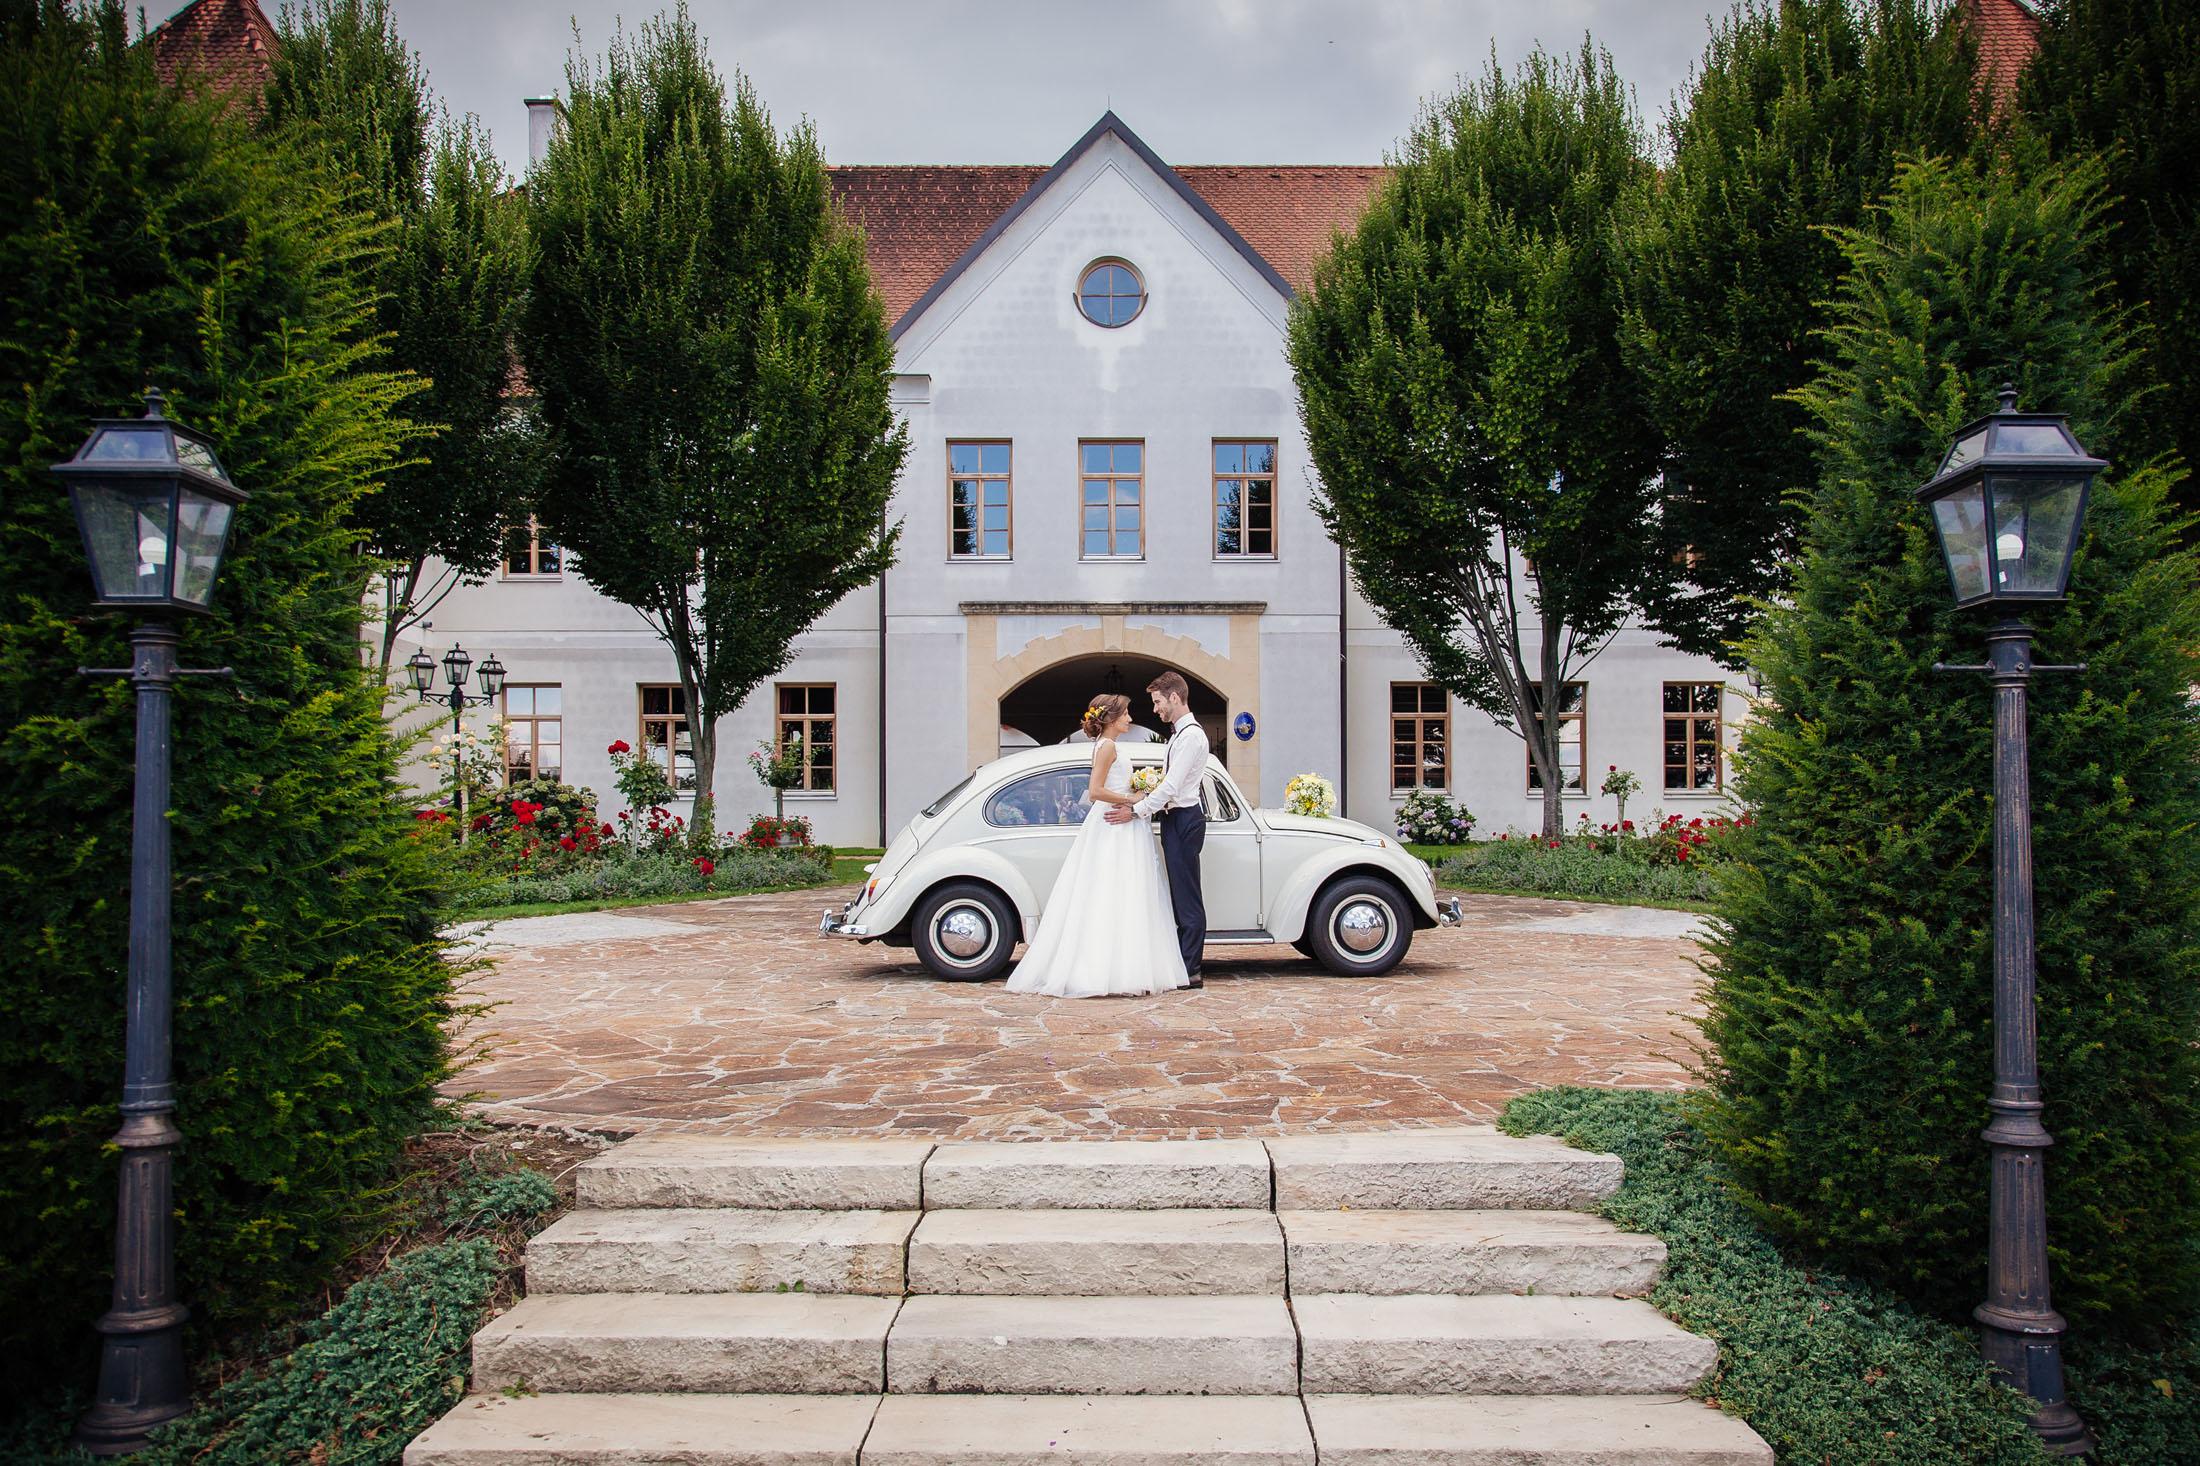 Hochzeit-Fotografie Karina & Johannes vor VW Käfer im Weinschloss Thaller